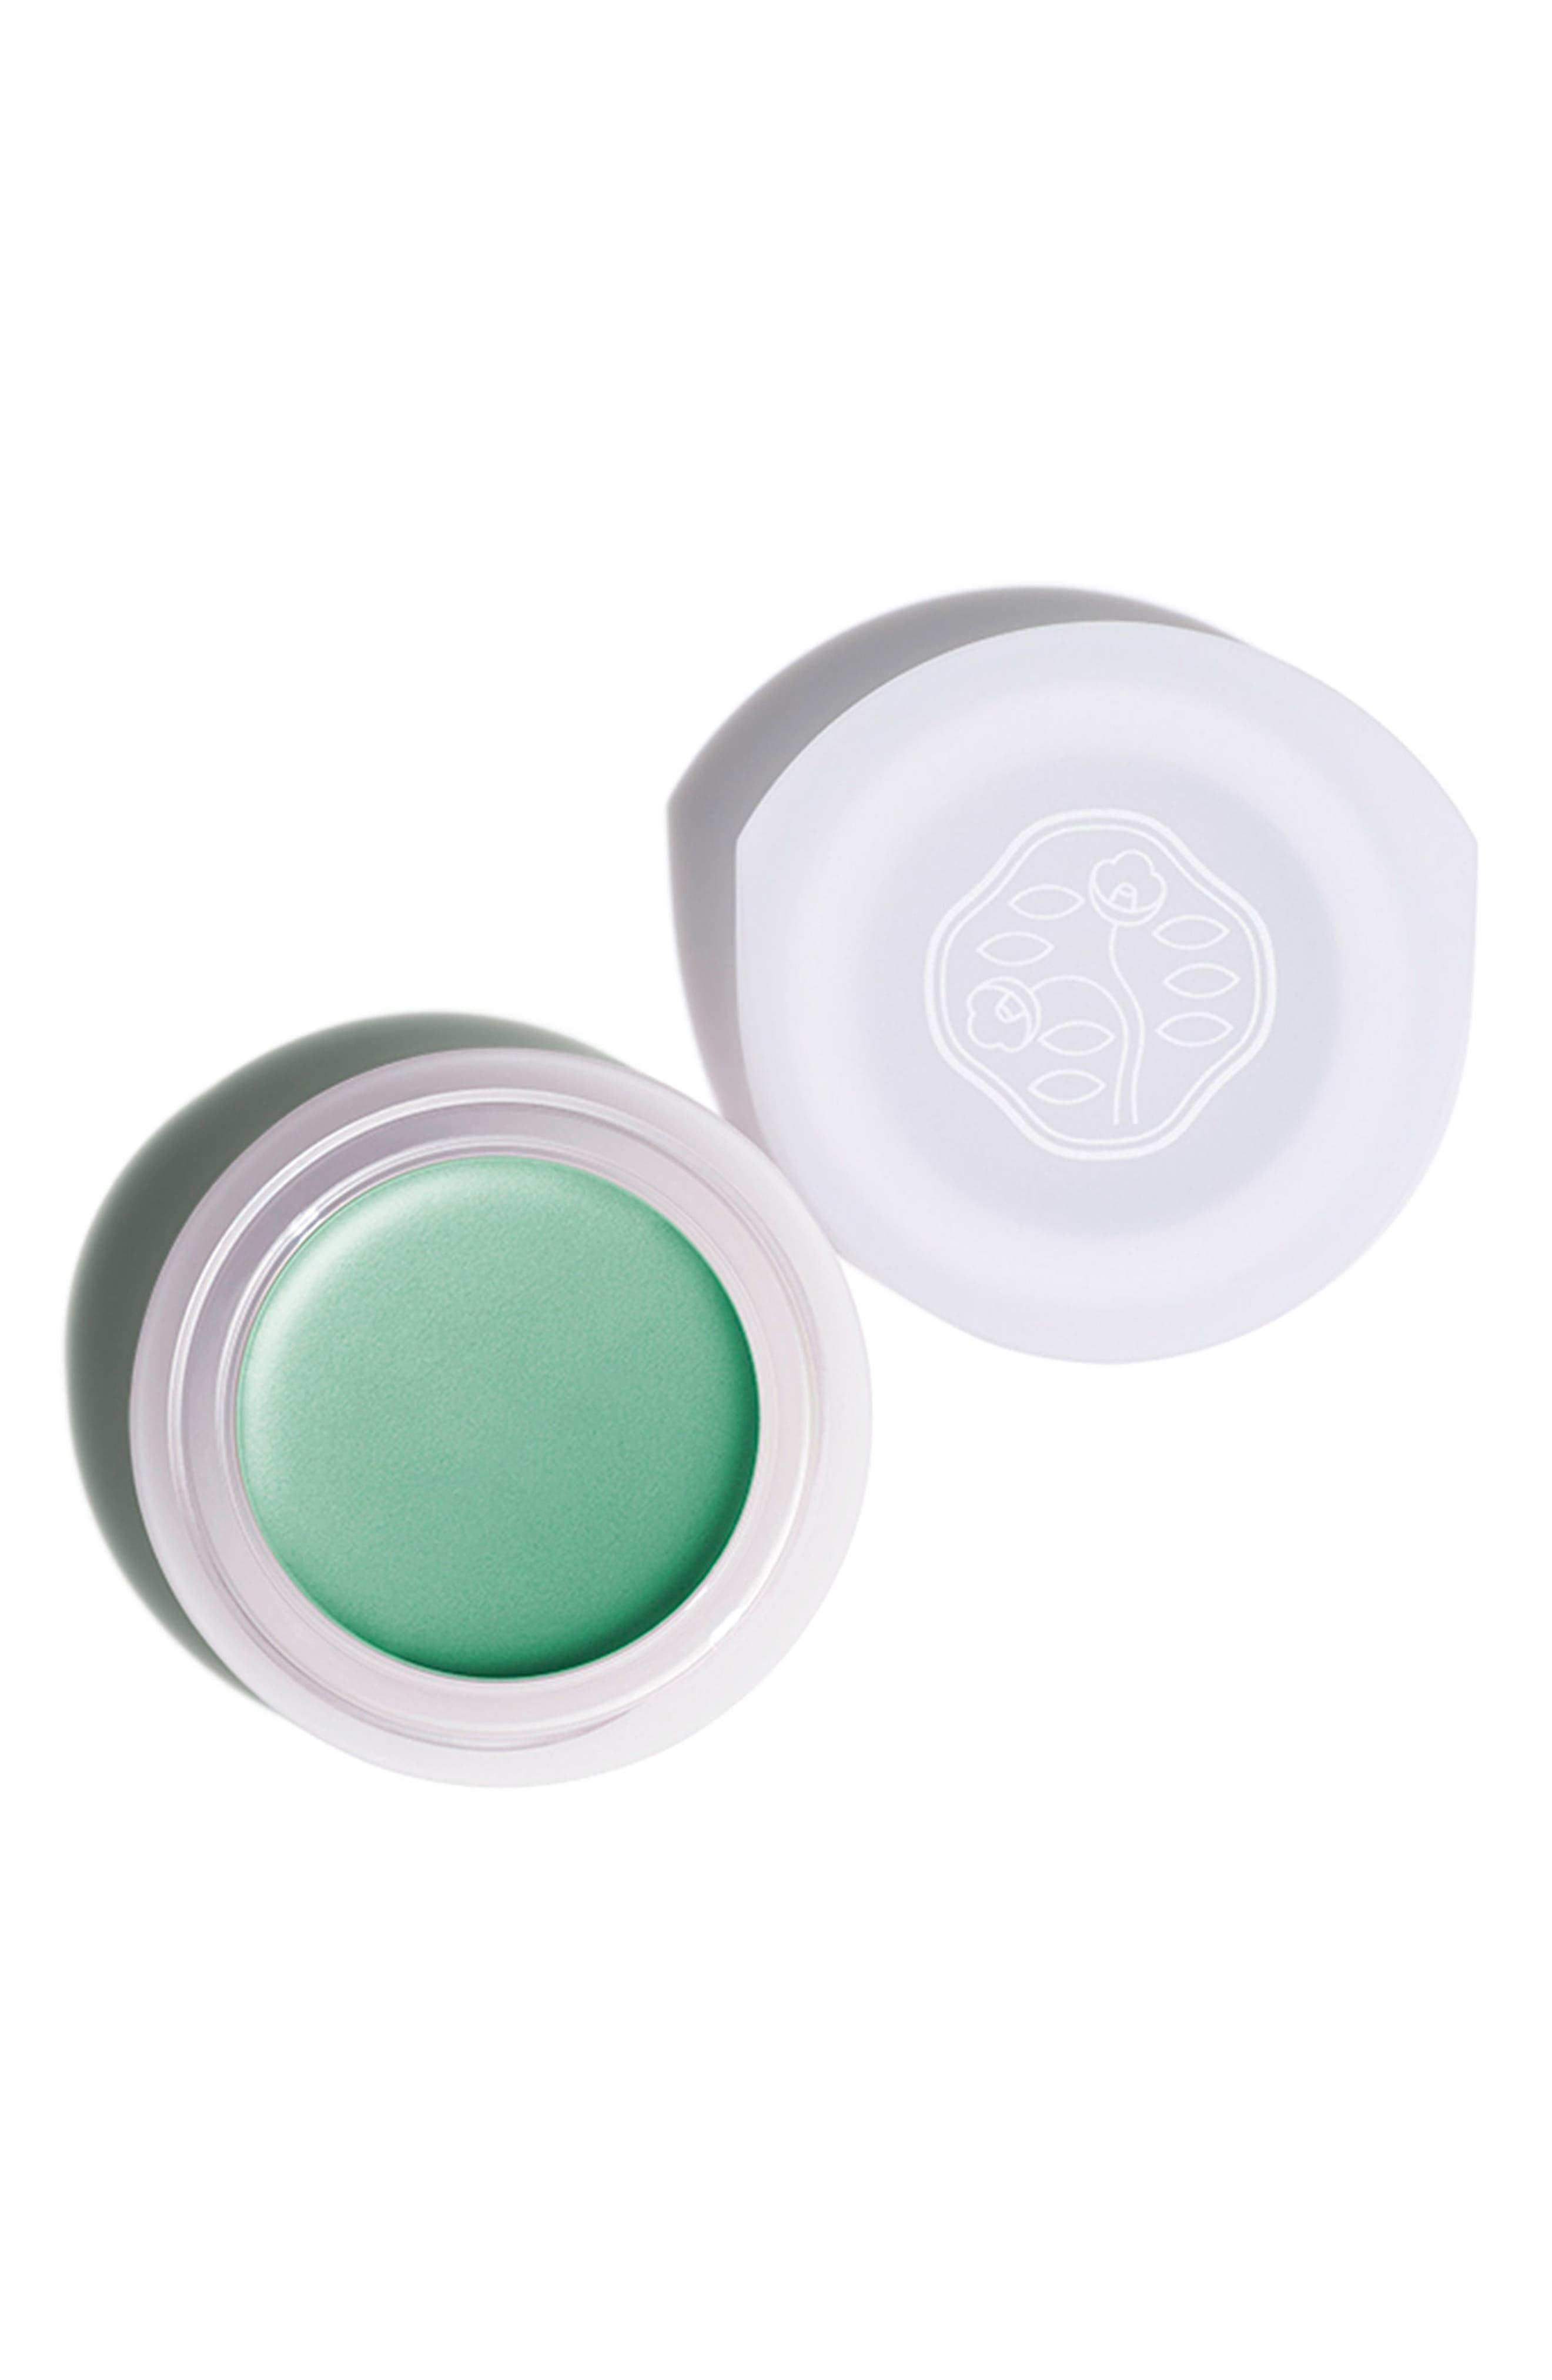 Paperlight Cream Eye Color,                             Main thumbnail 1, color,                             Hisui Green